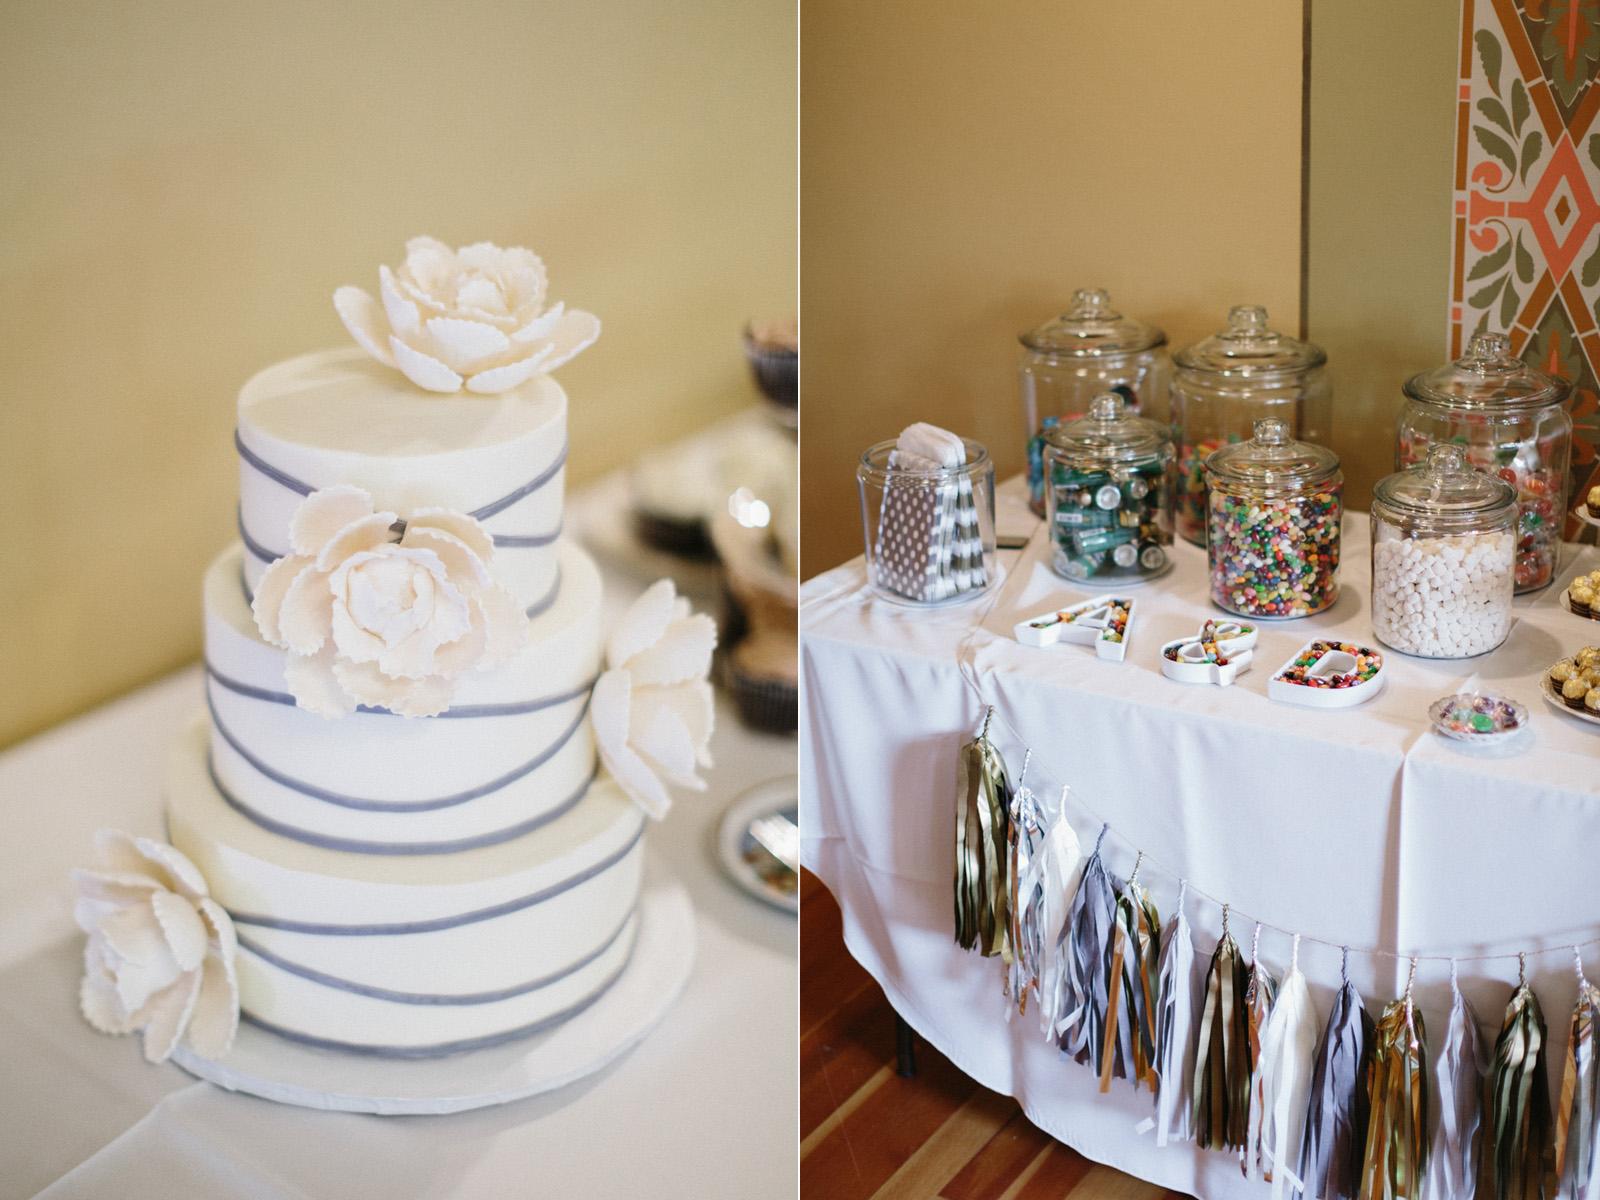 sioux_falls_desmoines_wedding_photographer_54.jpg